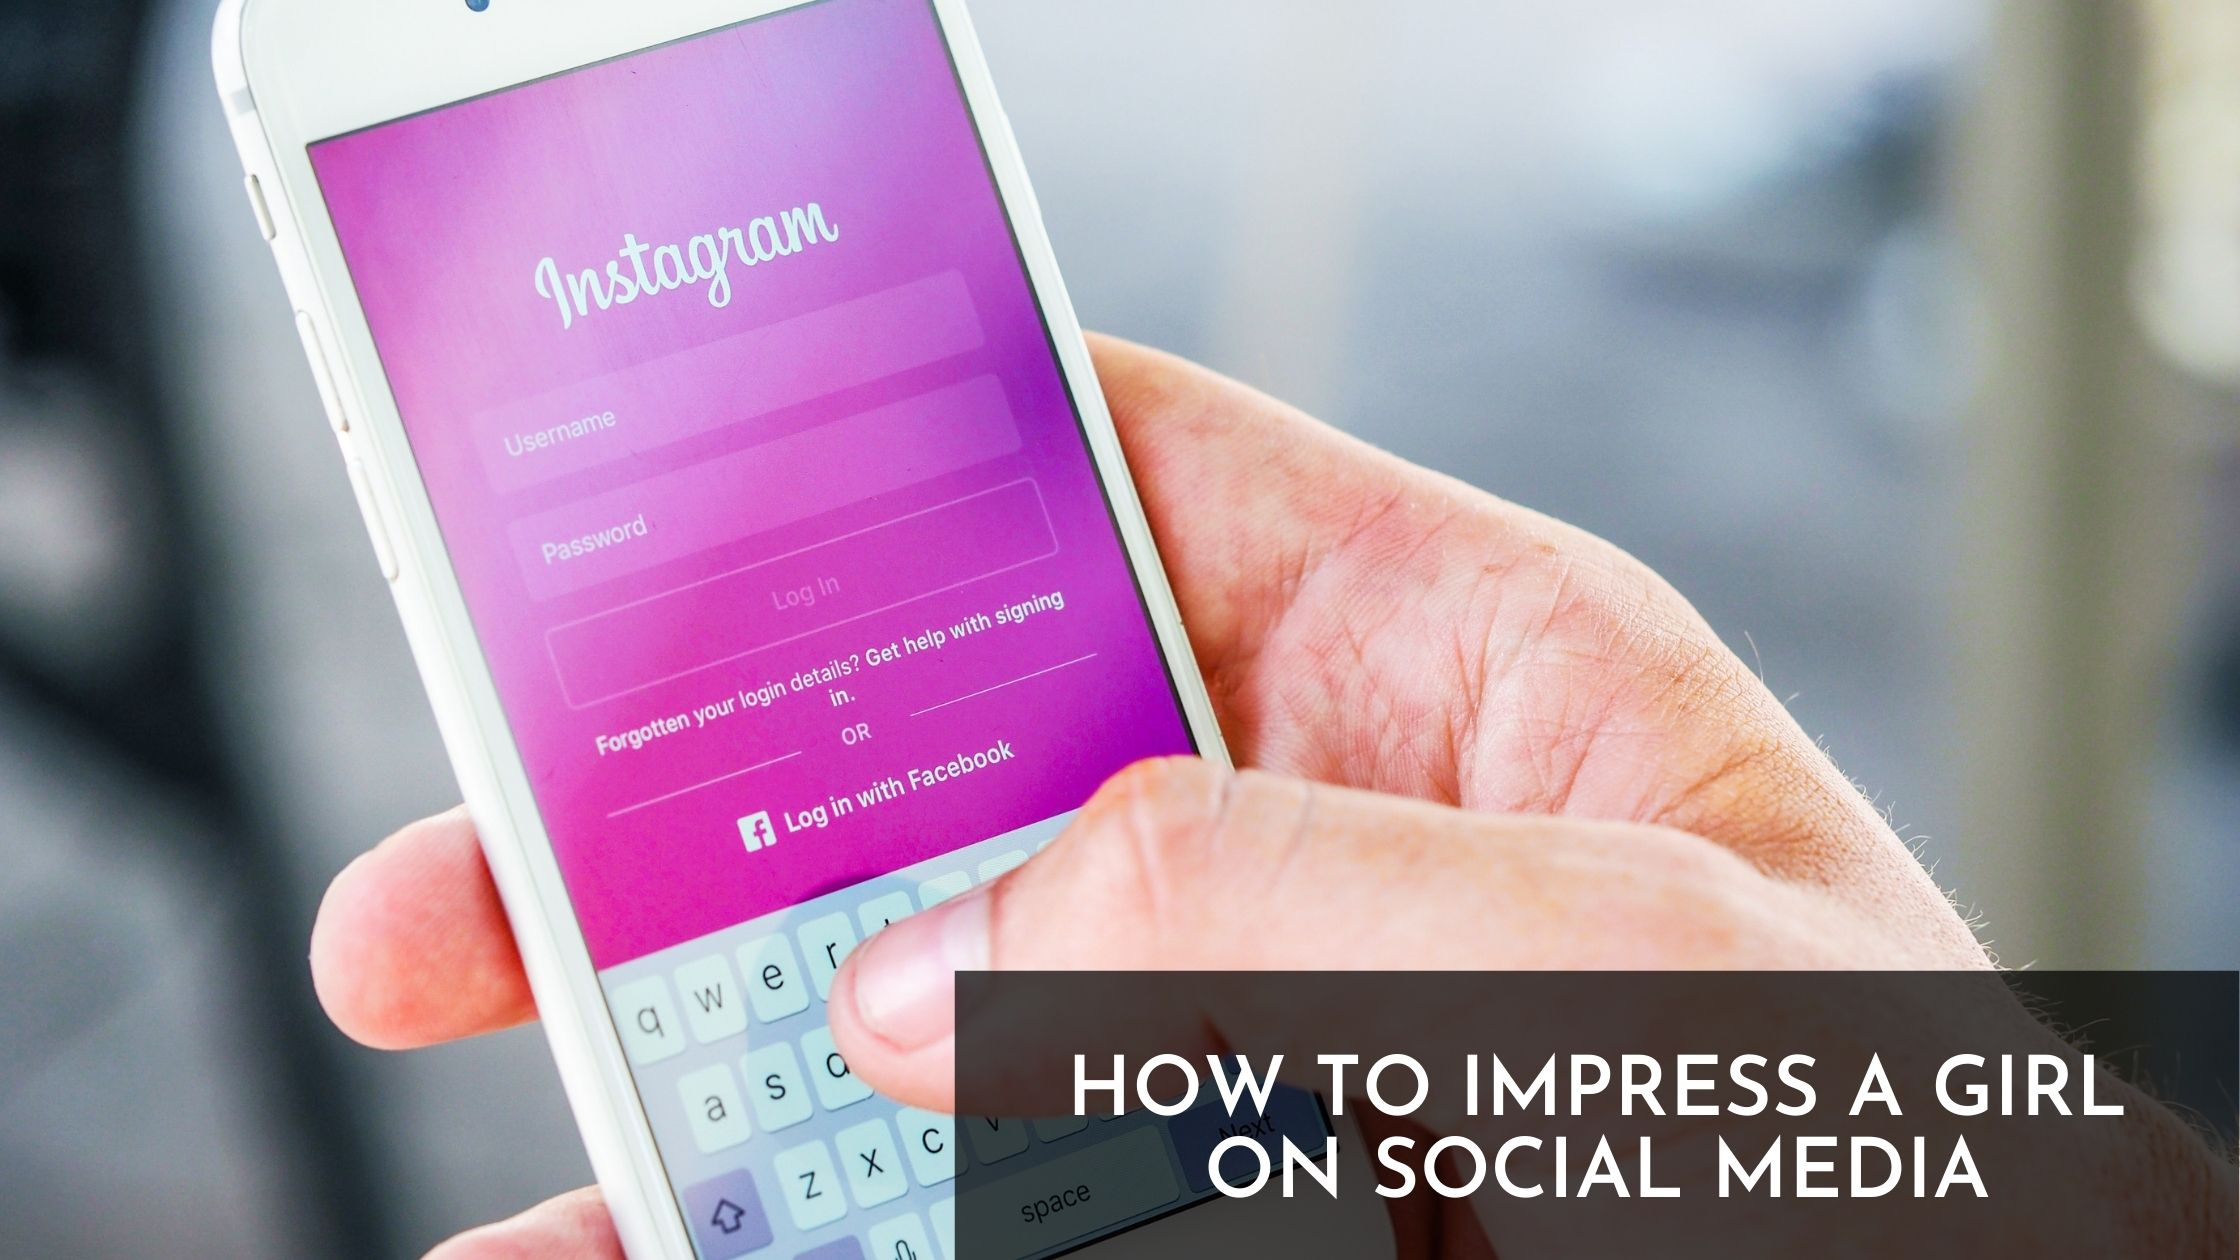 How to impress a girl on social media?